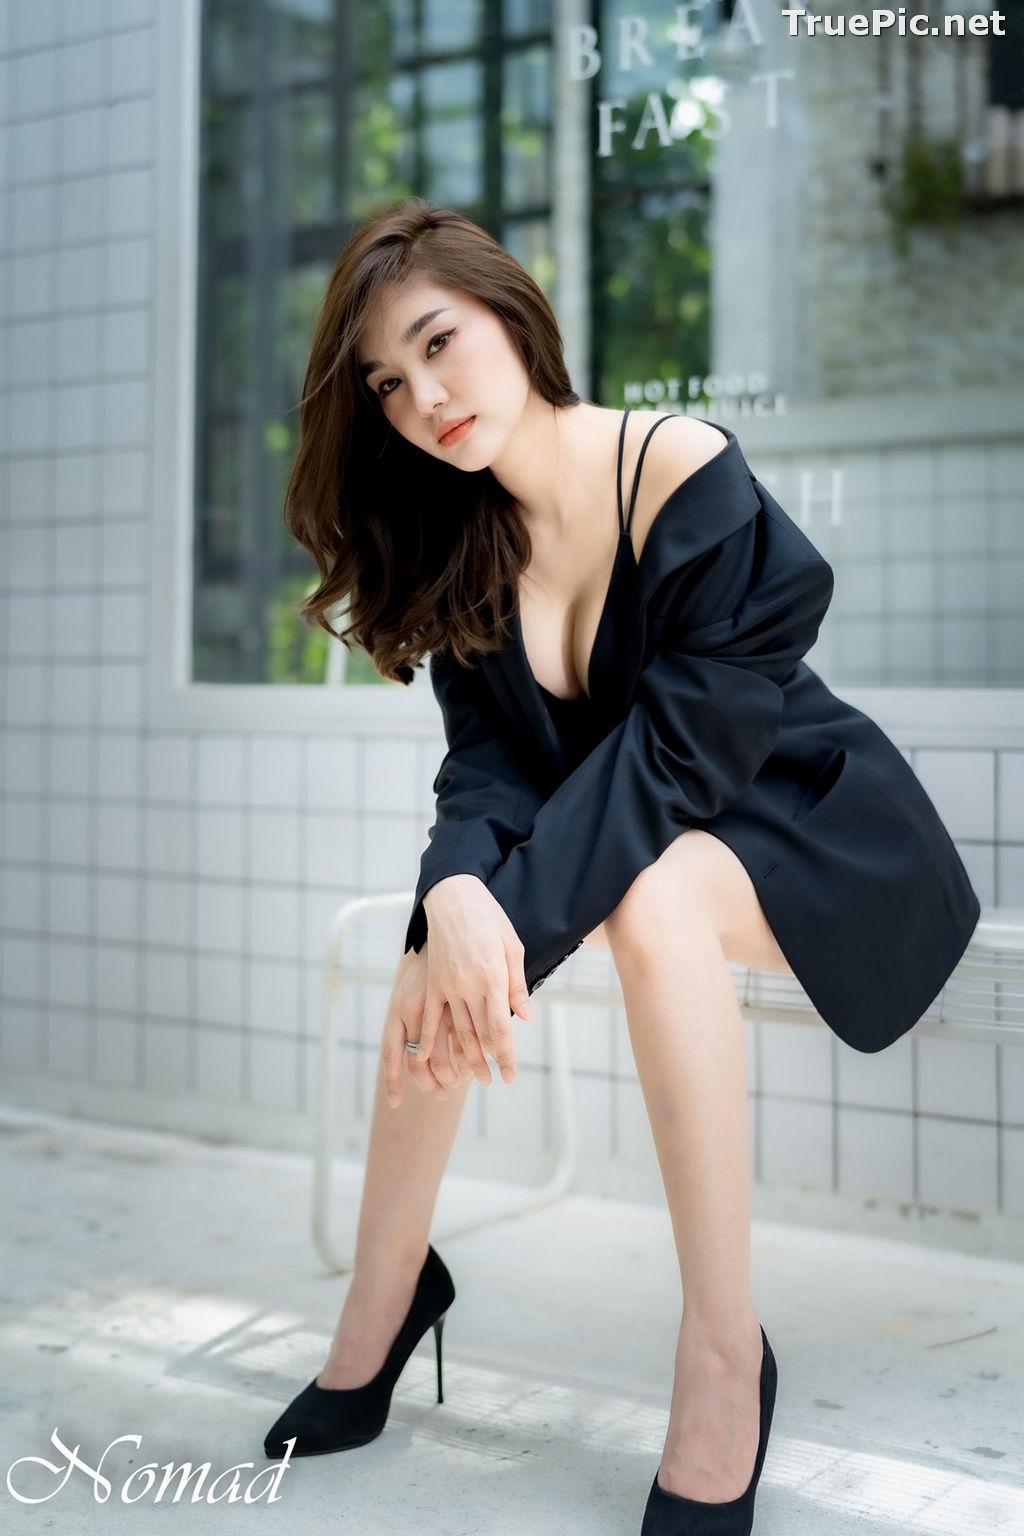 Image Thailand Model - Jarunan Tavepanya - Beautiful In Black and White - TruePic.net - Picture-7